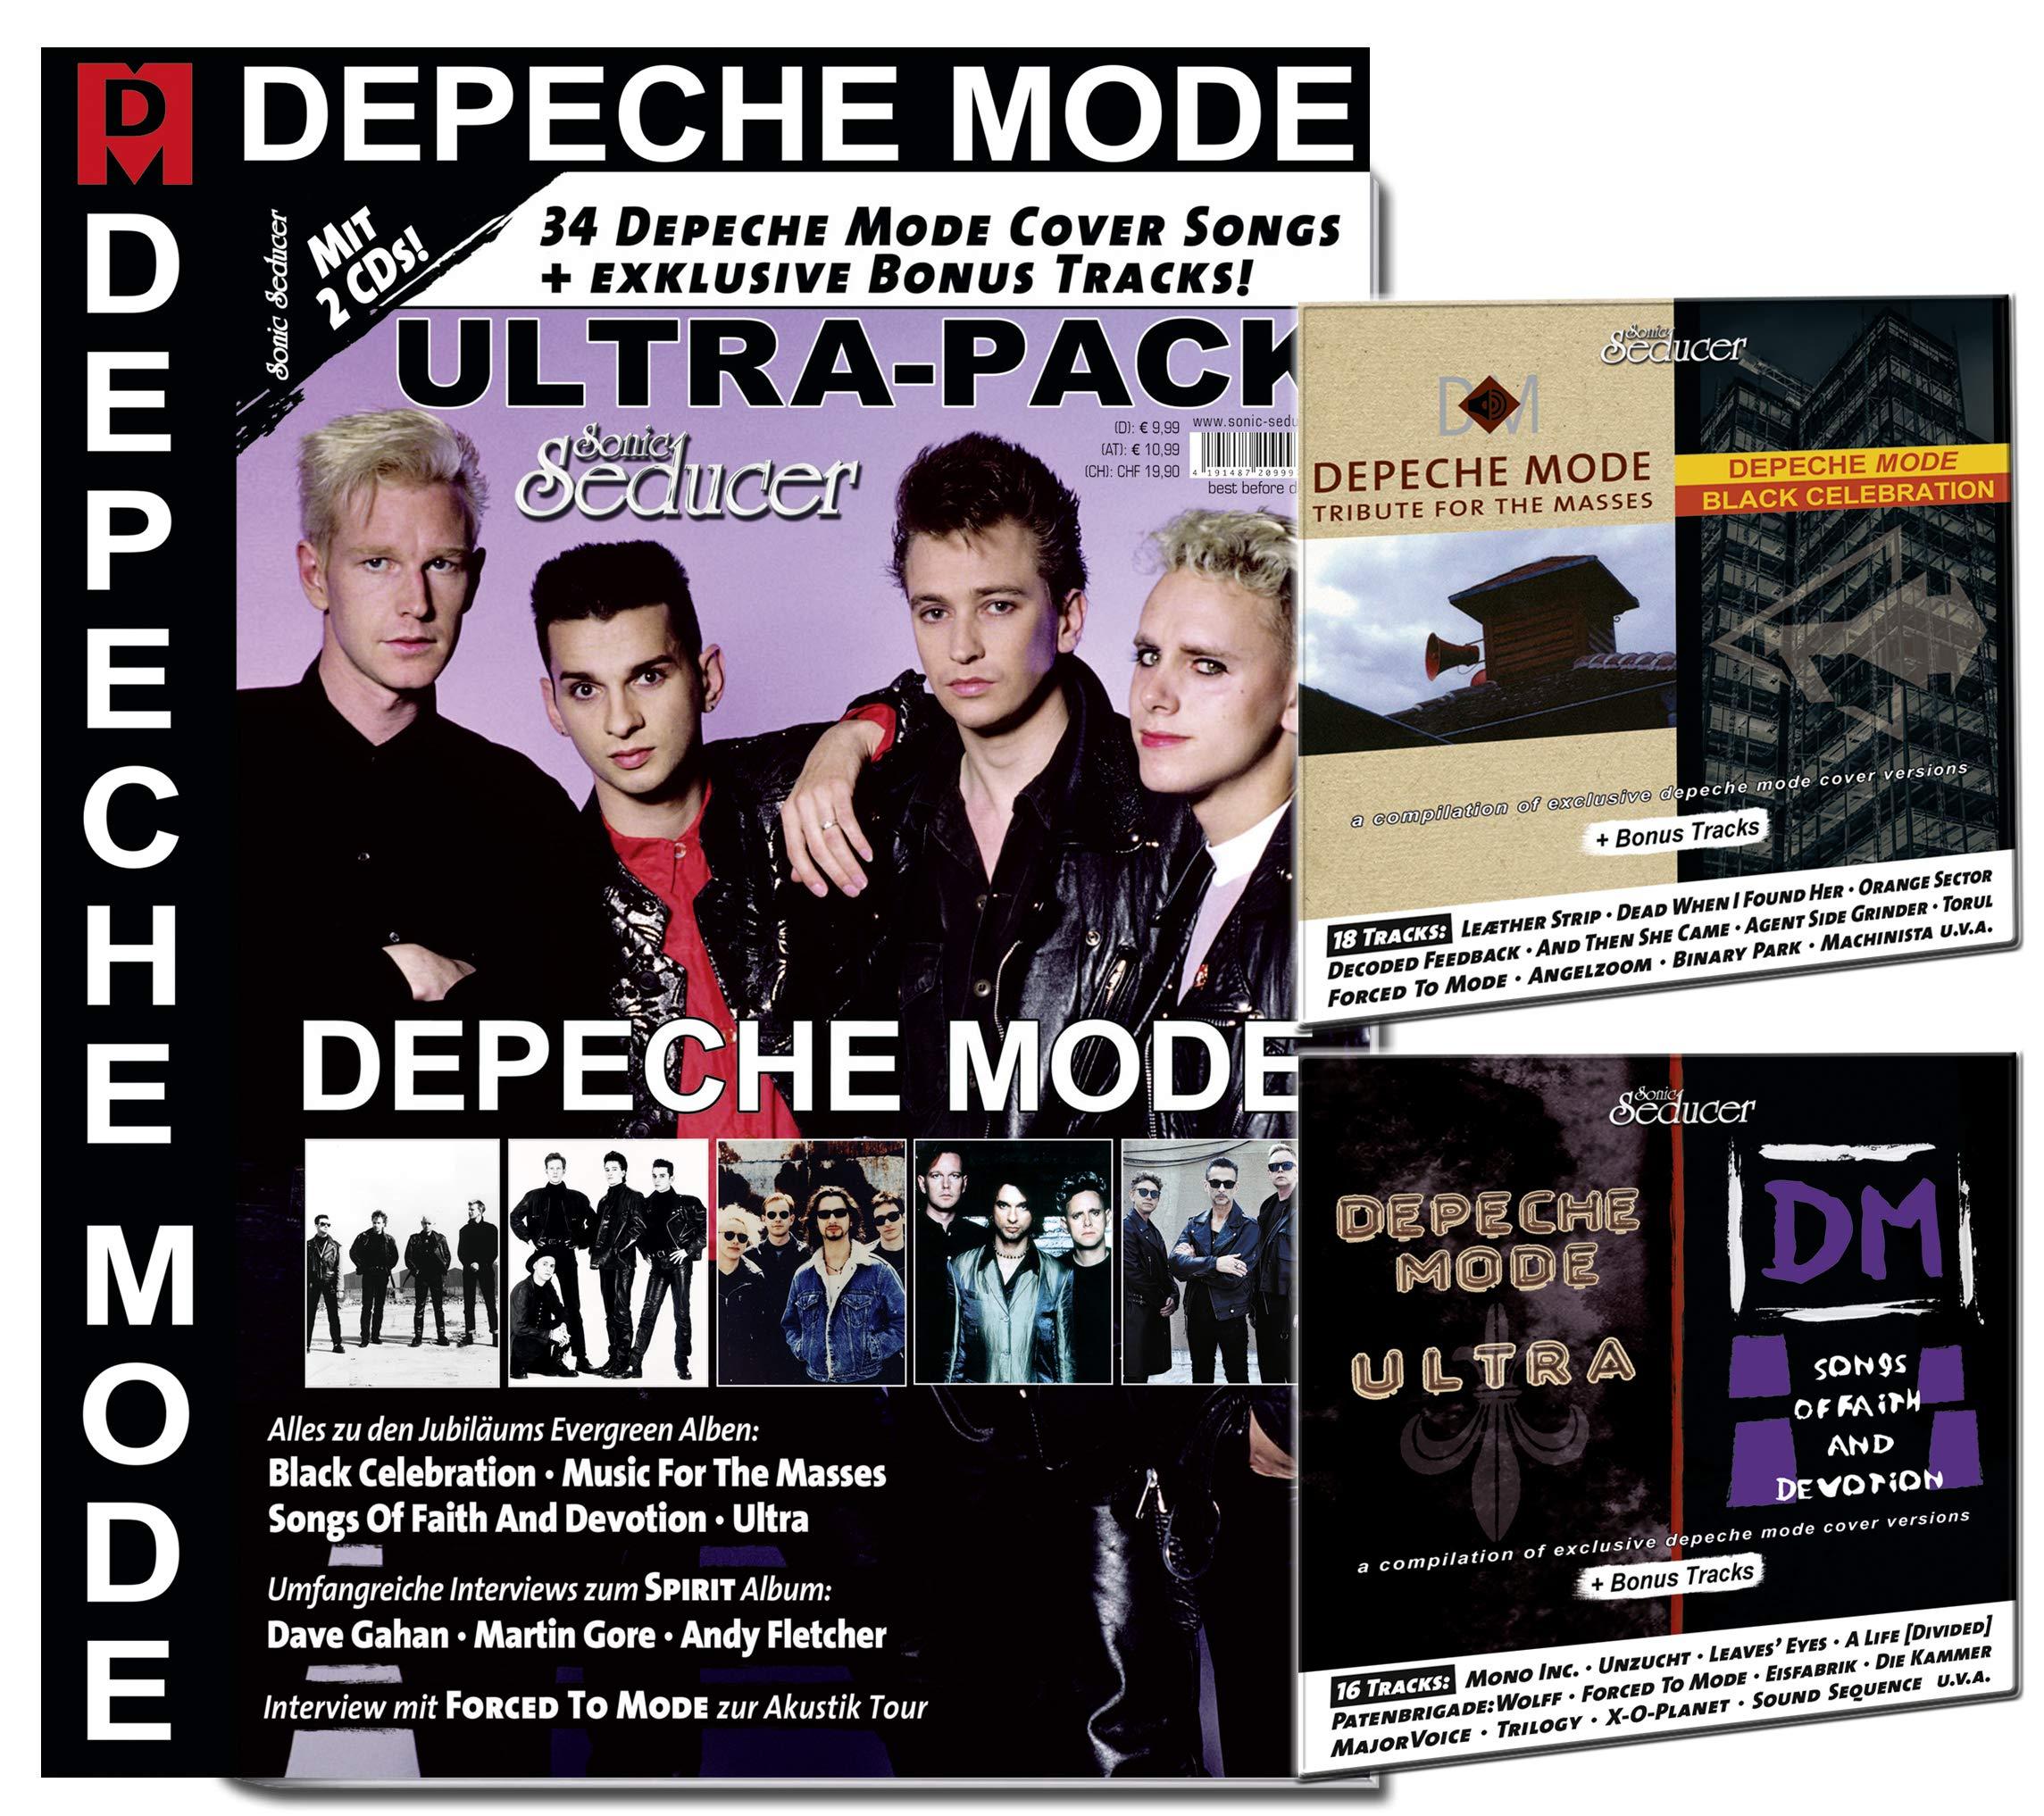 Sonic Seducer Depeche Mode Ultra-Pack: Amazon.es: Sonic Seducer: Libros en idiomas extranjeros